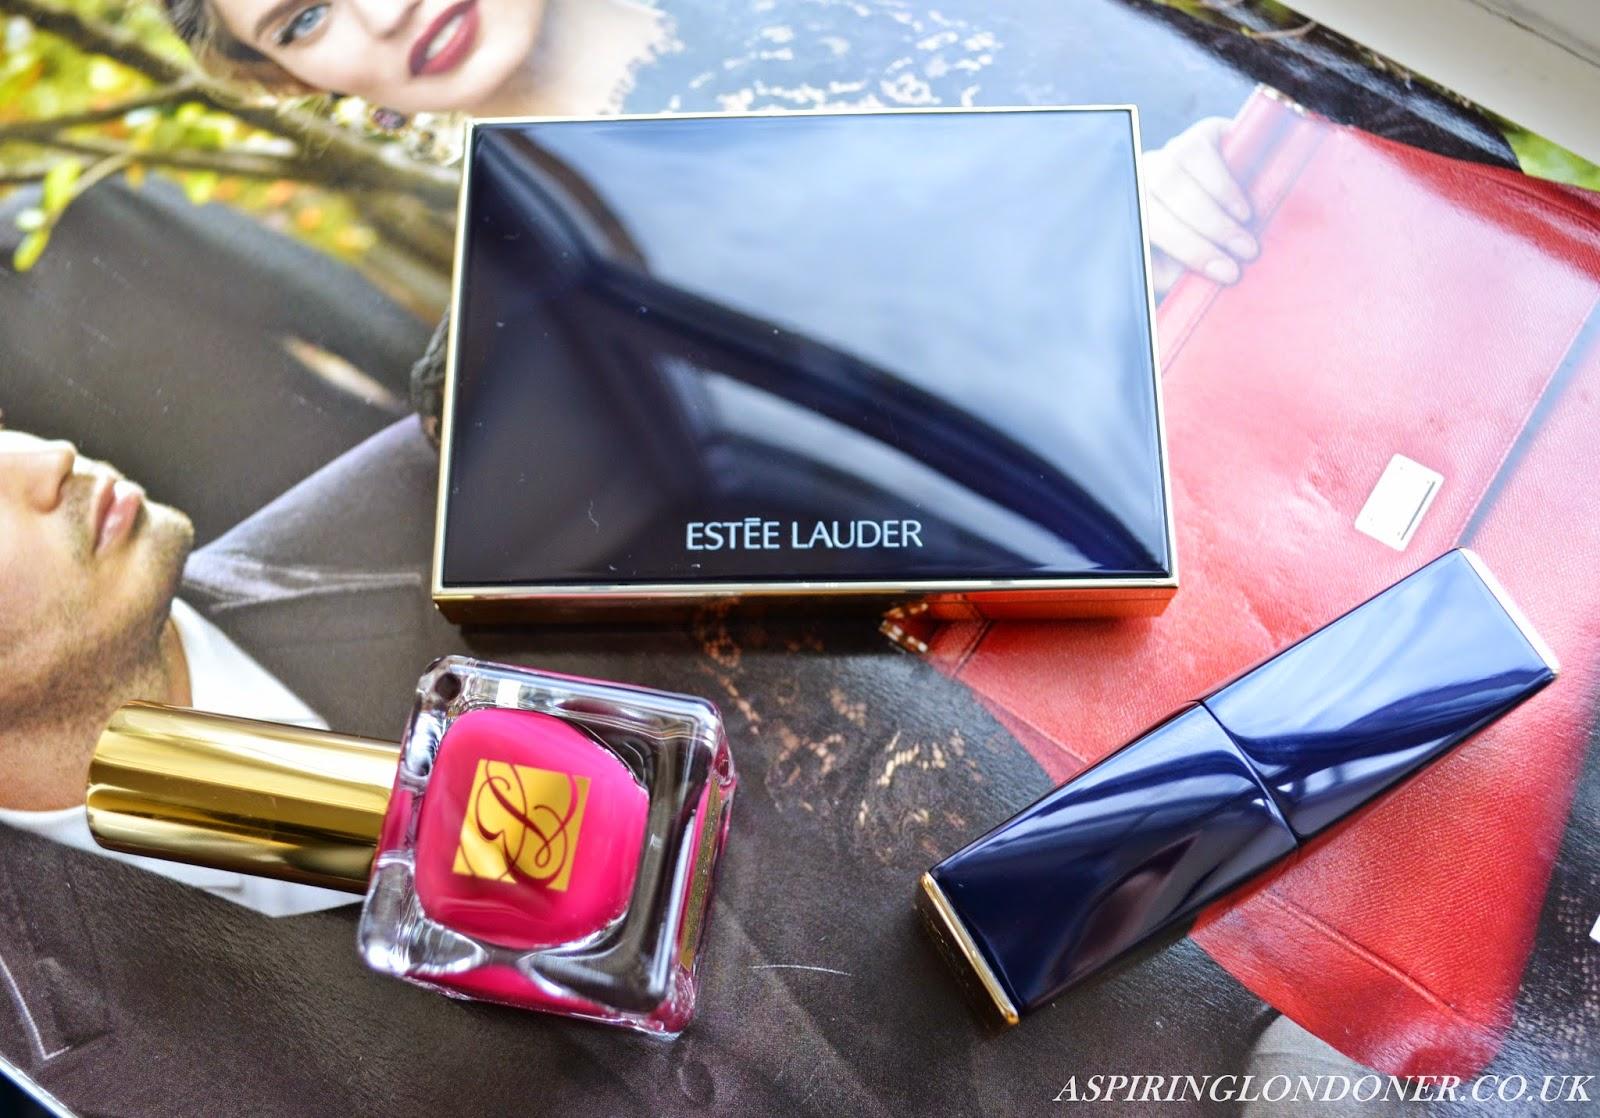 Estee Lauder Pure Color Envy Collection - Aspiring Londoner